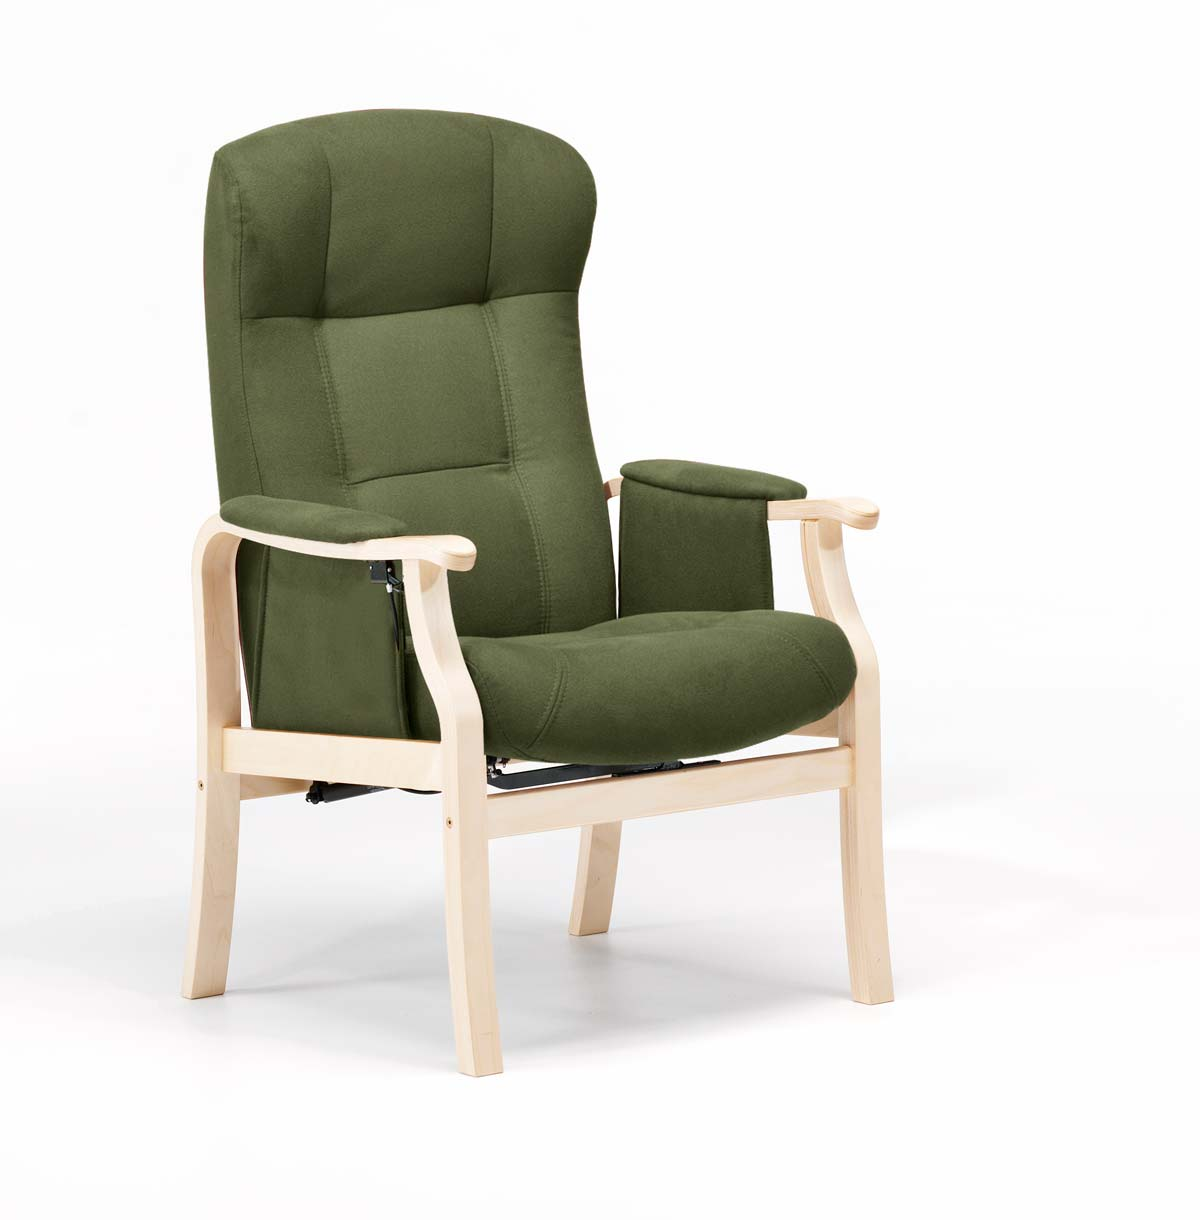 NORDIC-C Sorø Standard seniorstol, eksl. skammel - oliven